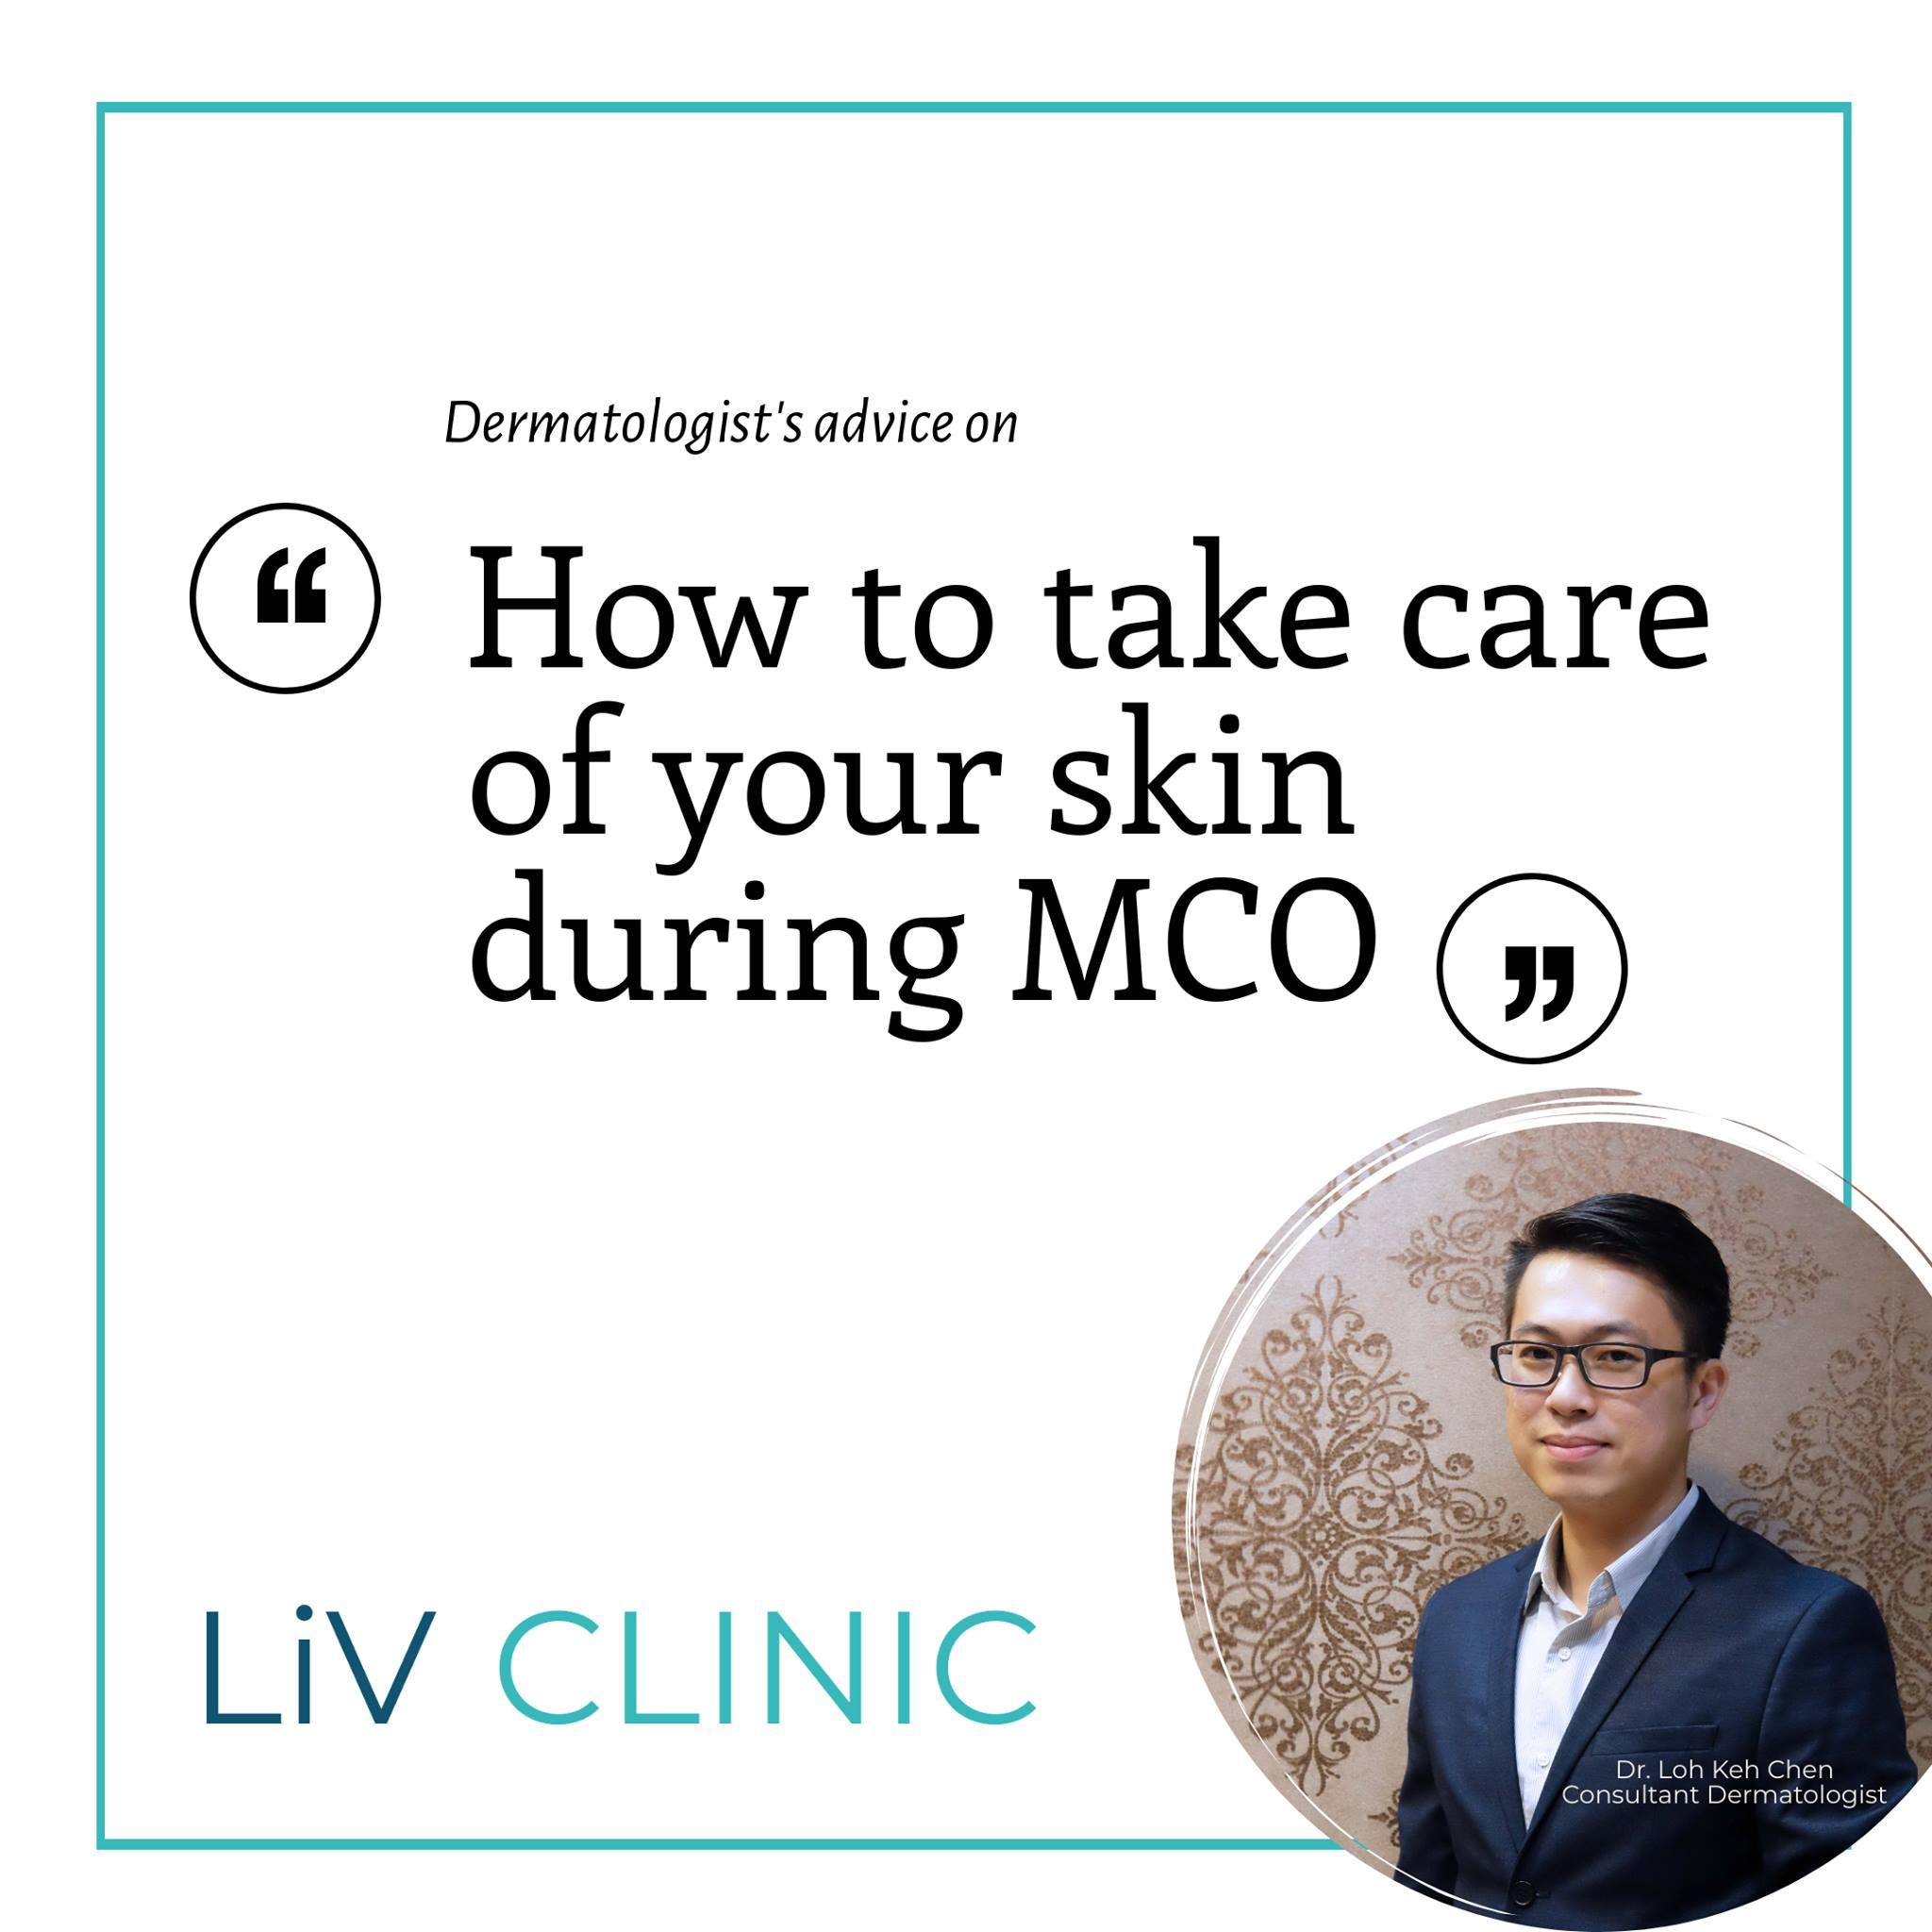 Facial Treatment During MCO